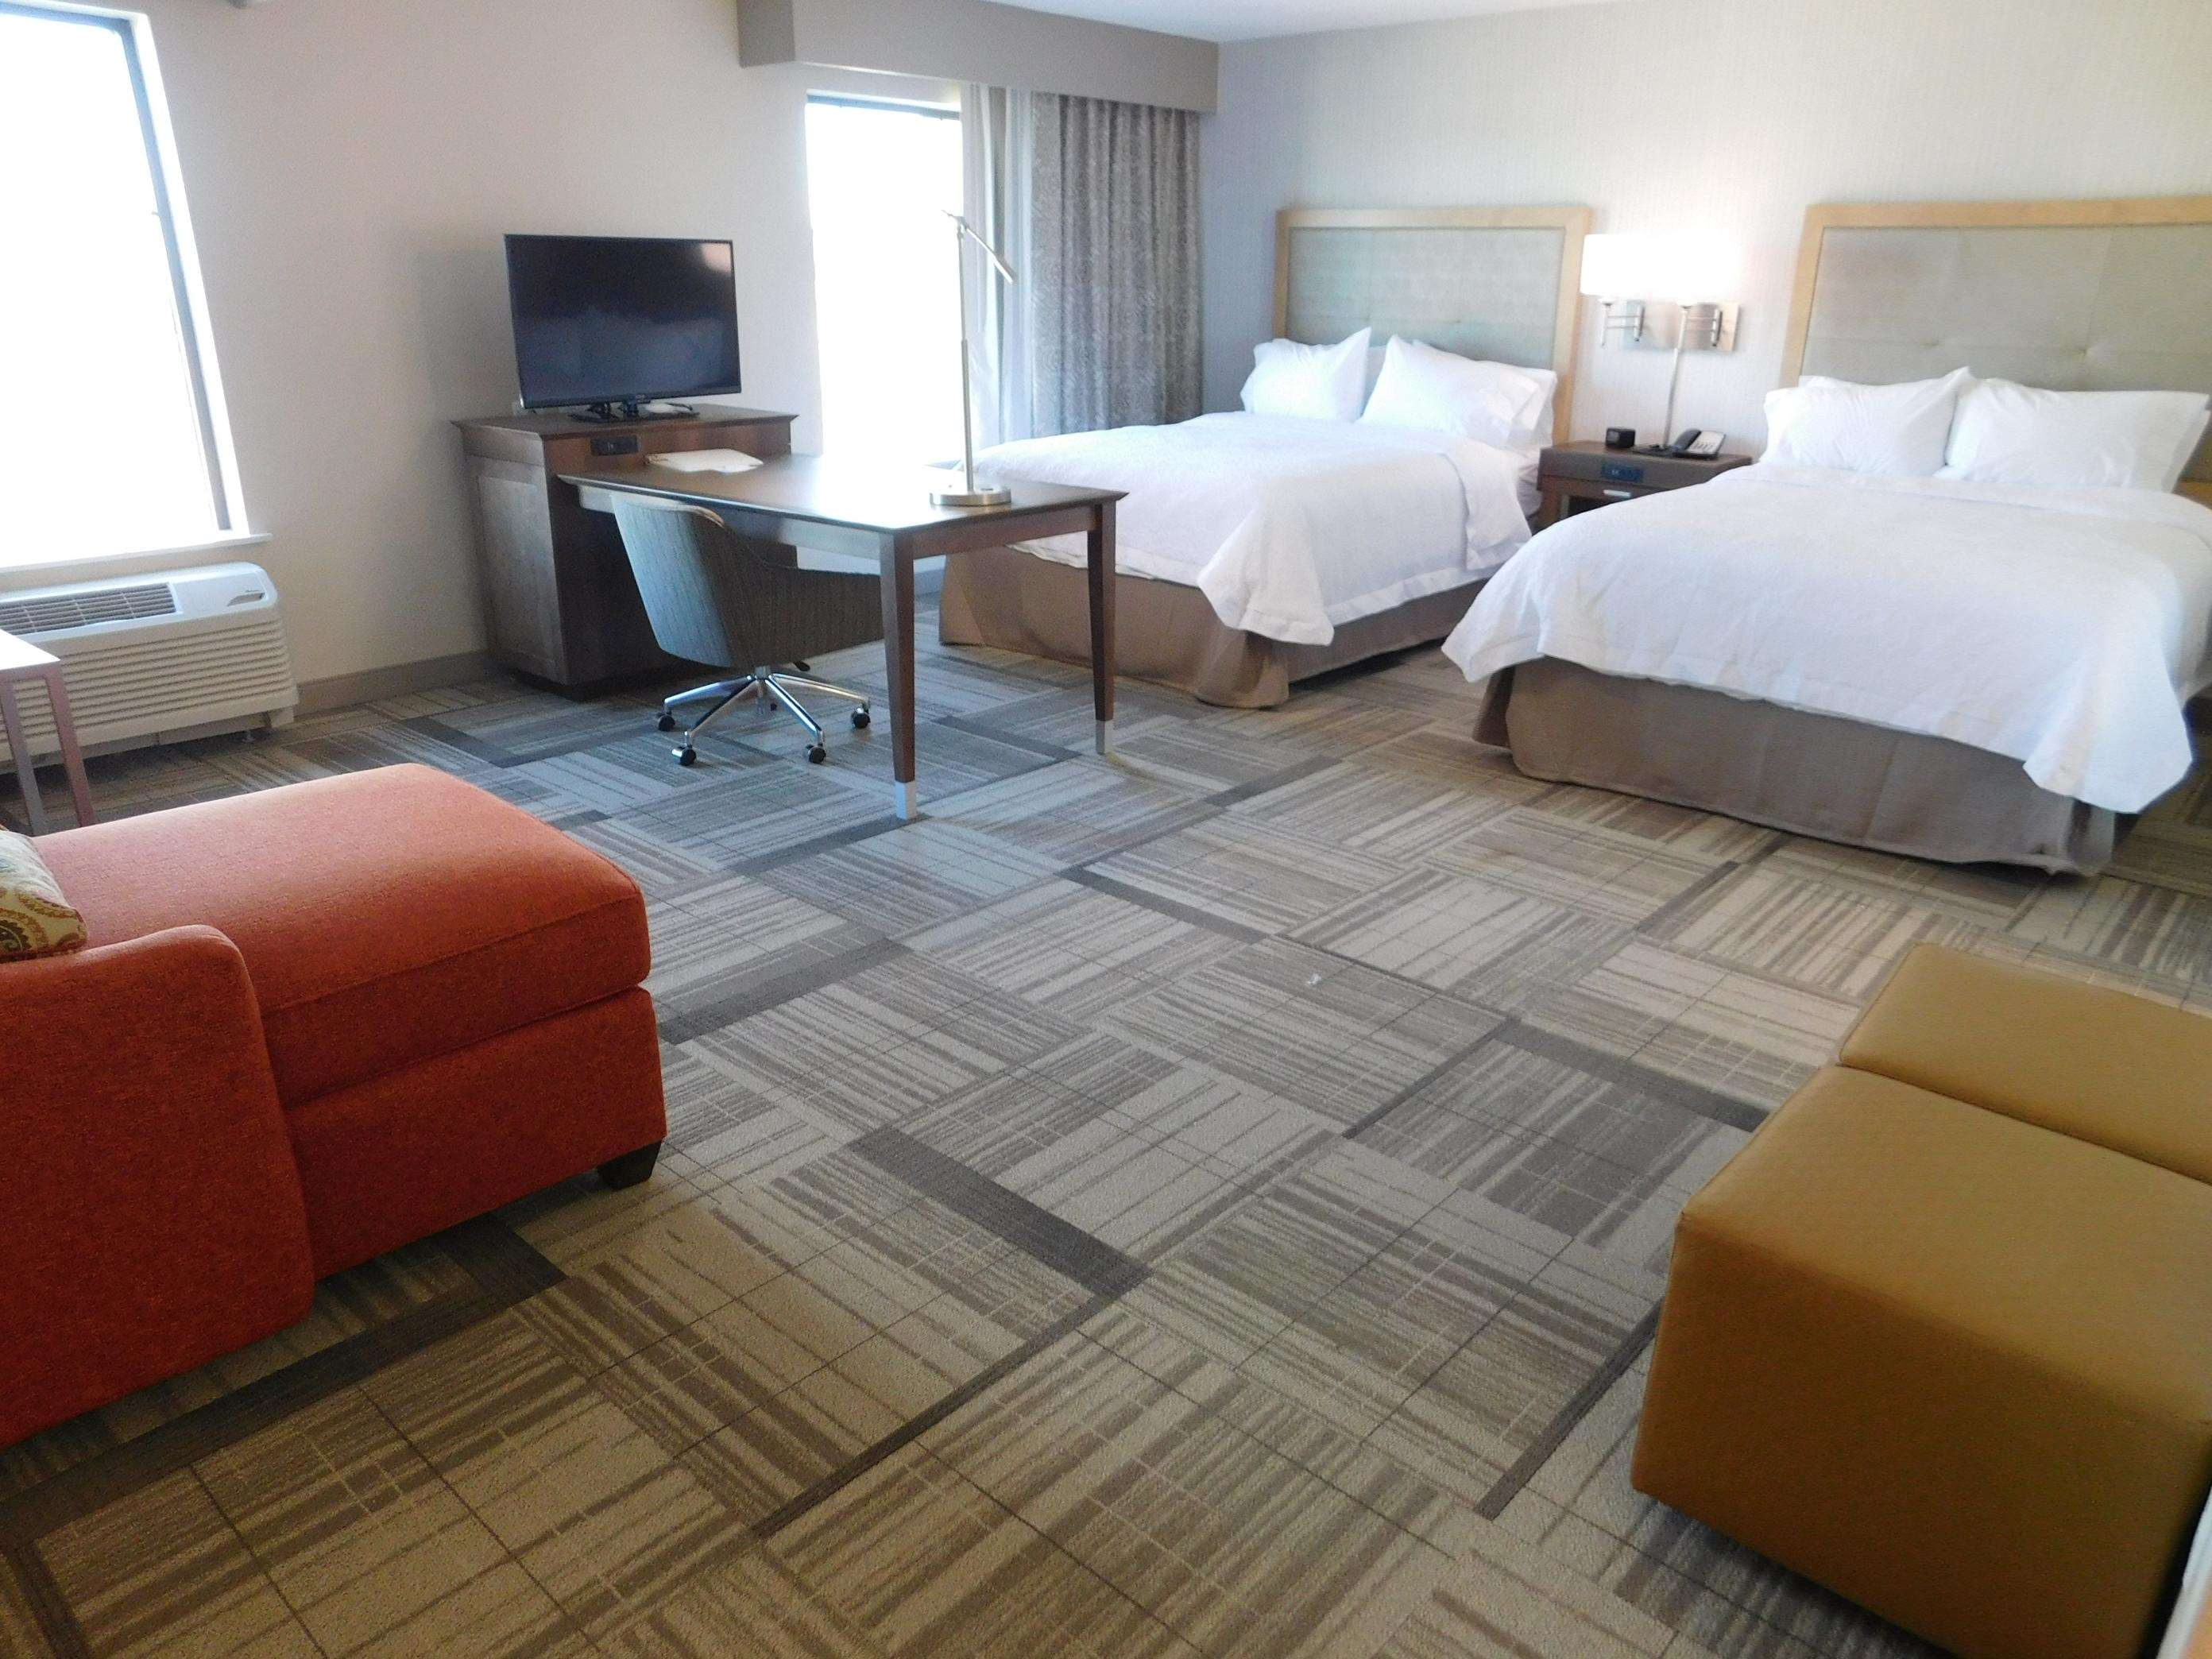 Hampton Inn & Suites Artesia image 2